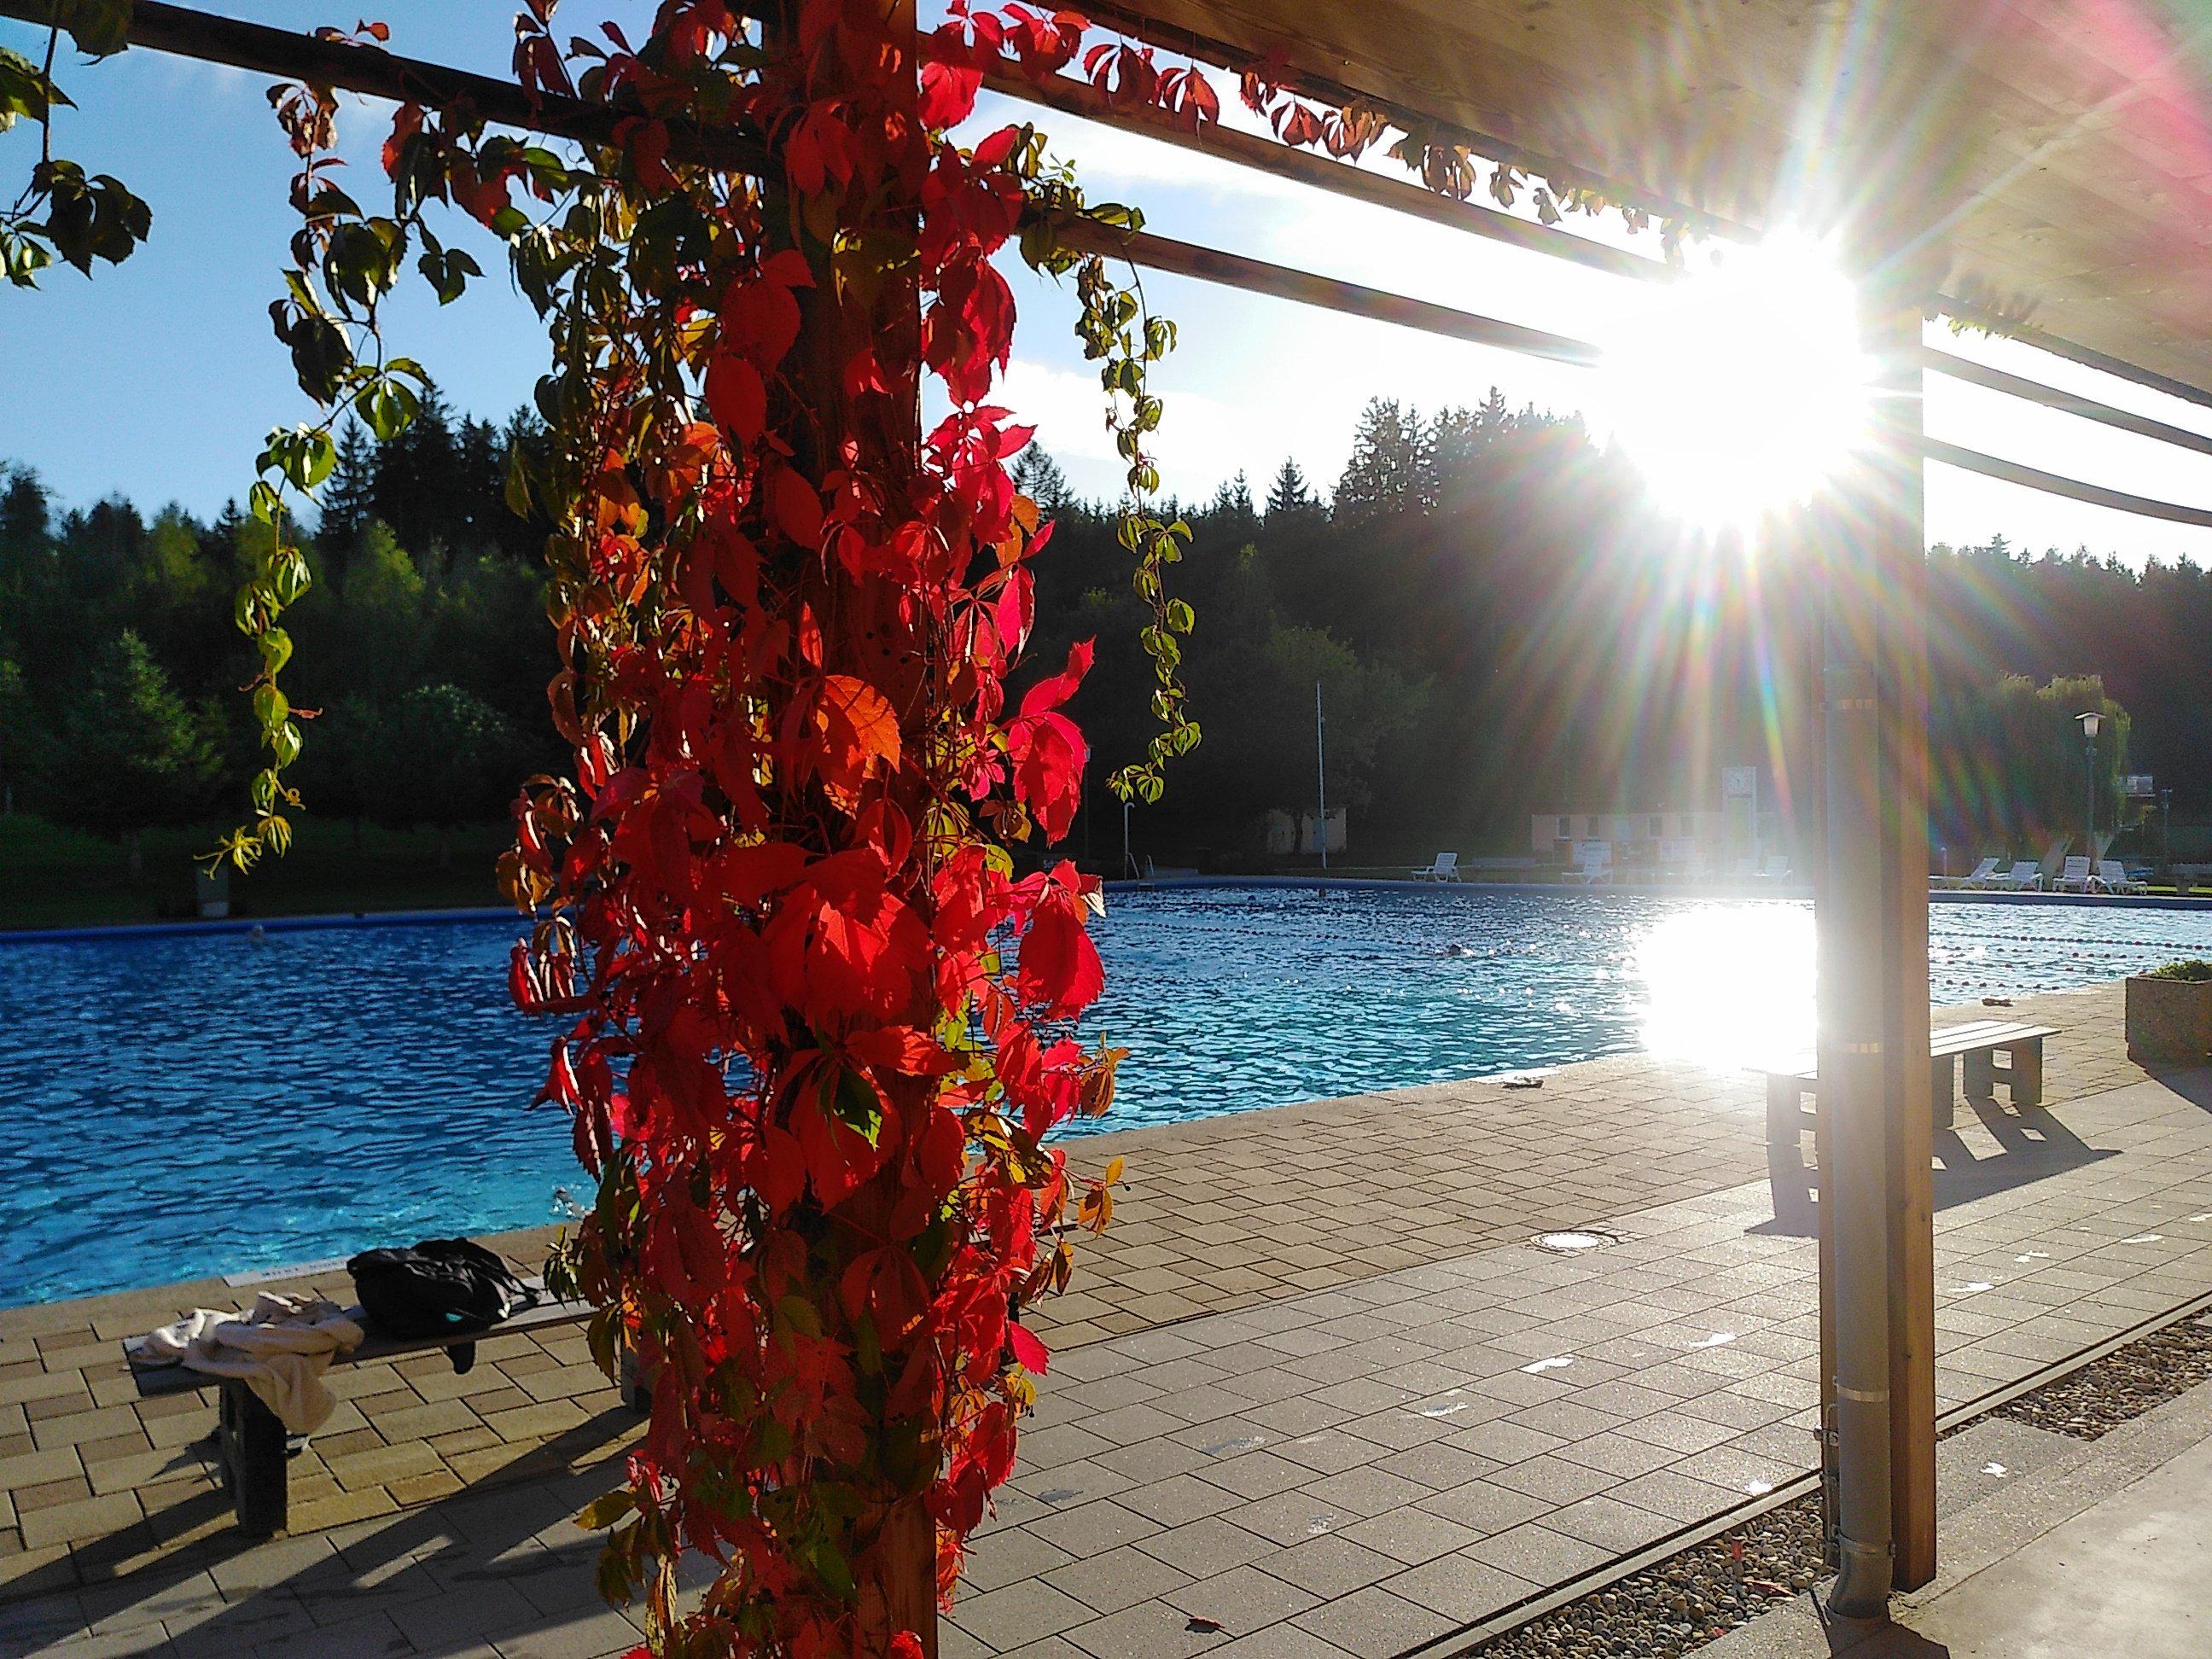 Leuchtend rote Jungfernrebe in Taufkirchen